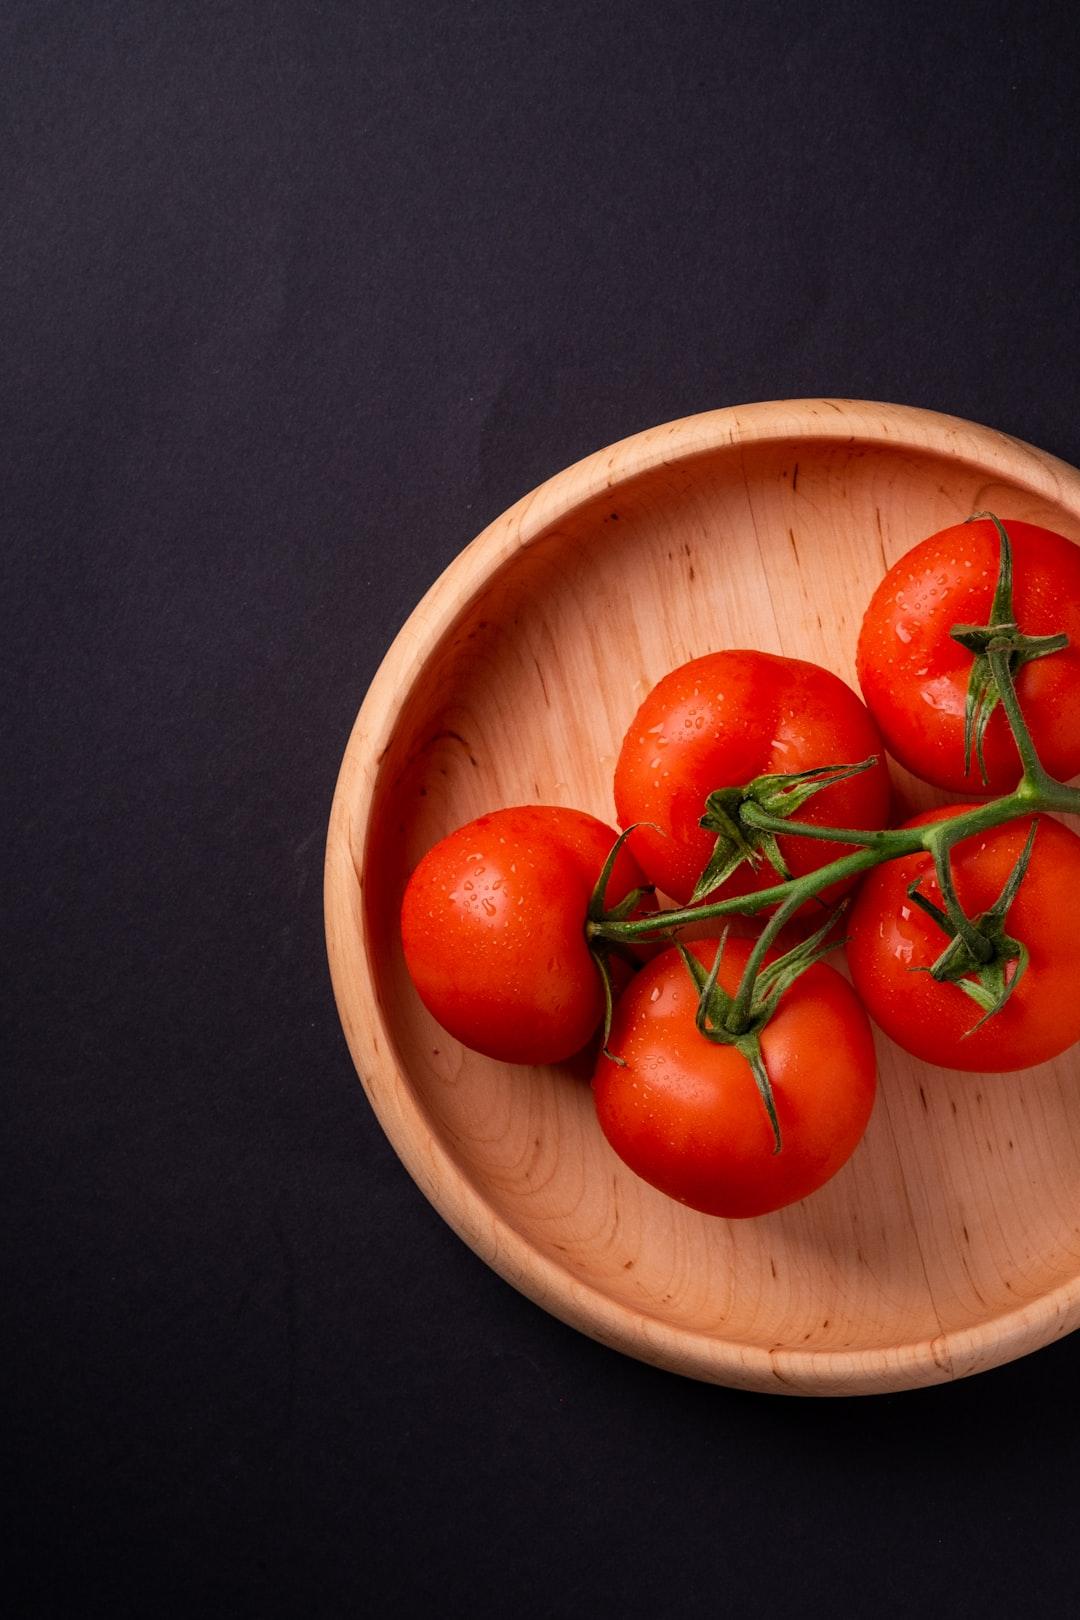 Tomatoes !!!